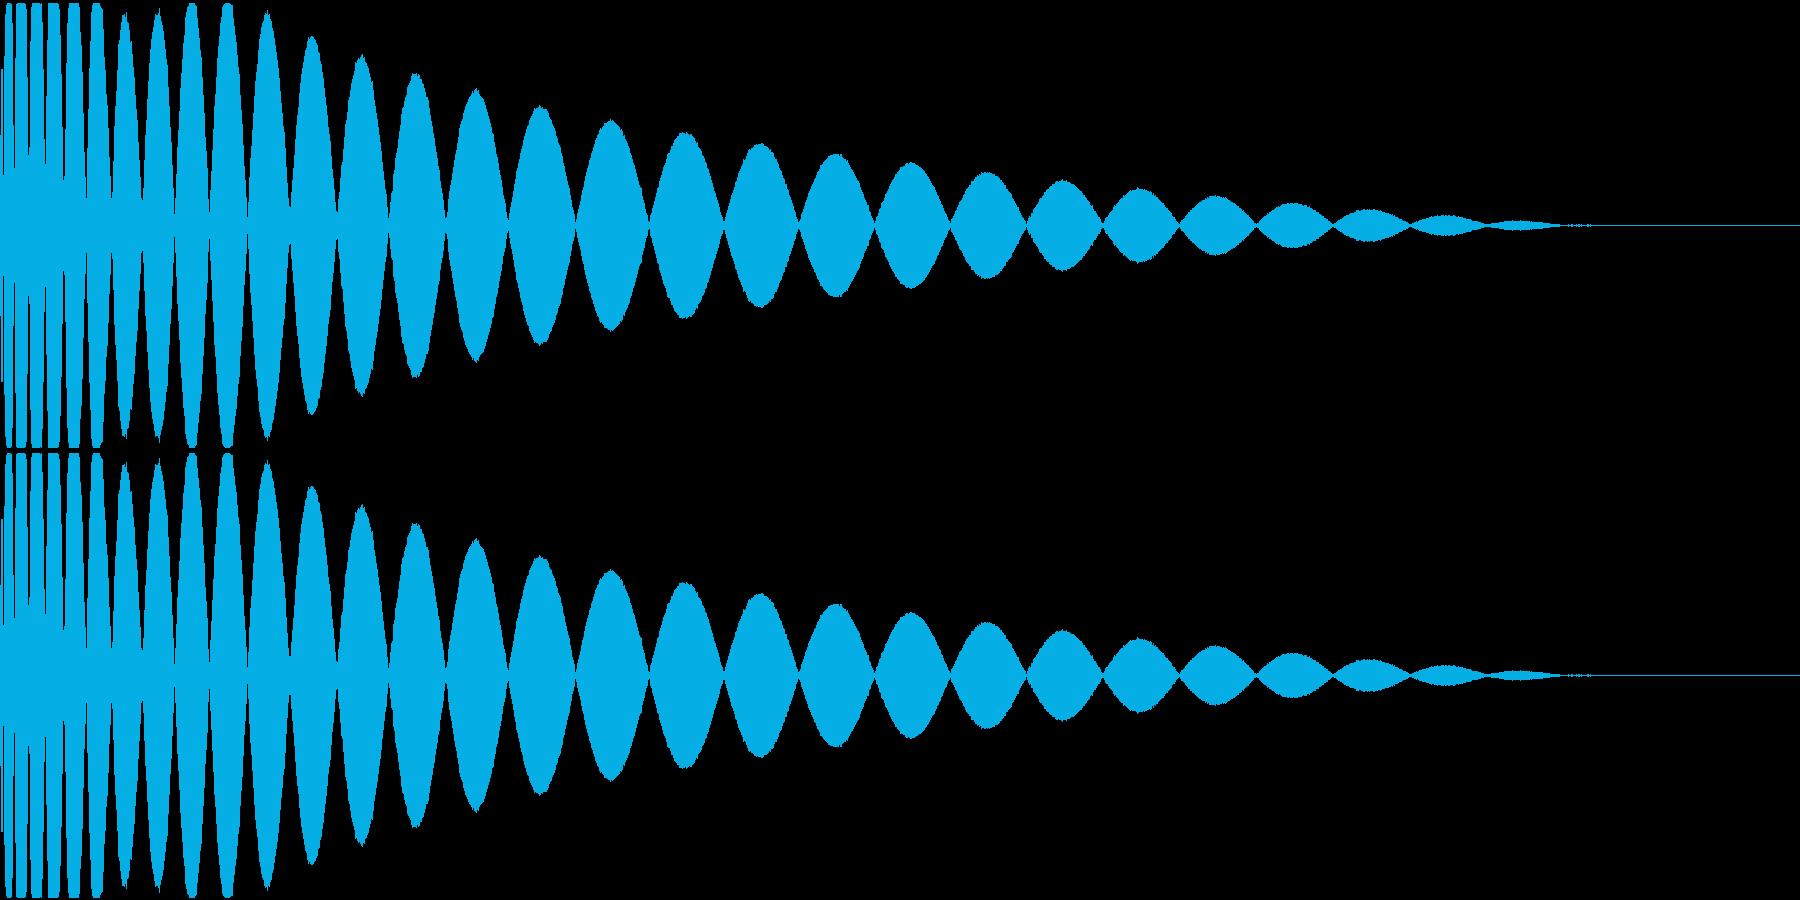 DTM Kick 87 オリジナル音源の再生済みの波形